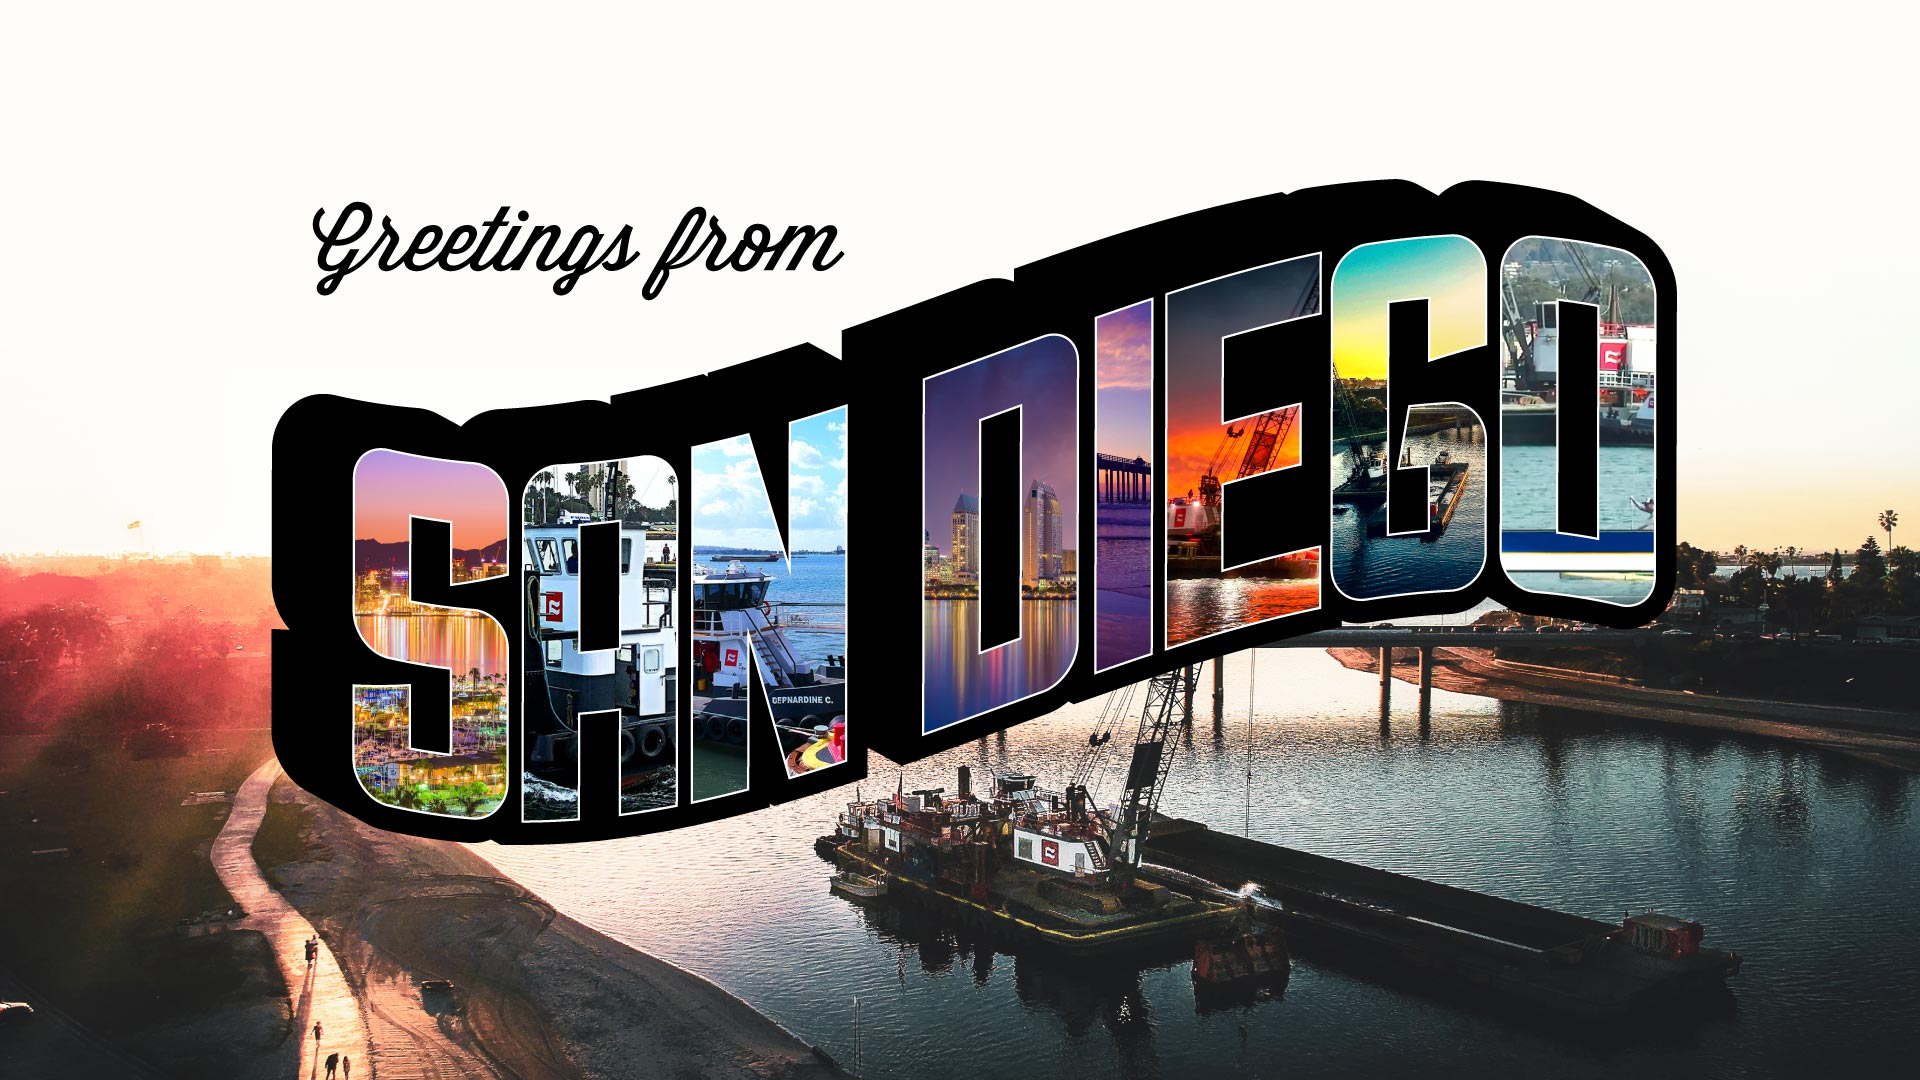 Curtin Maritime Services San Diego